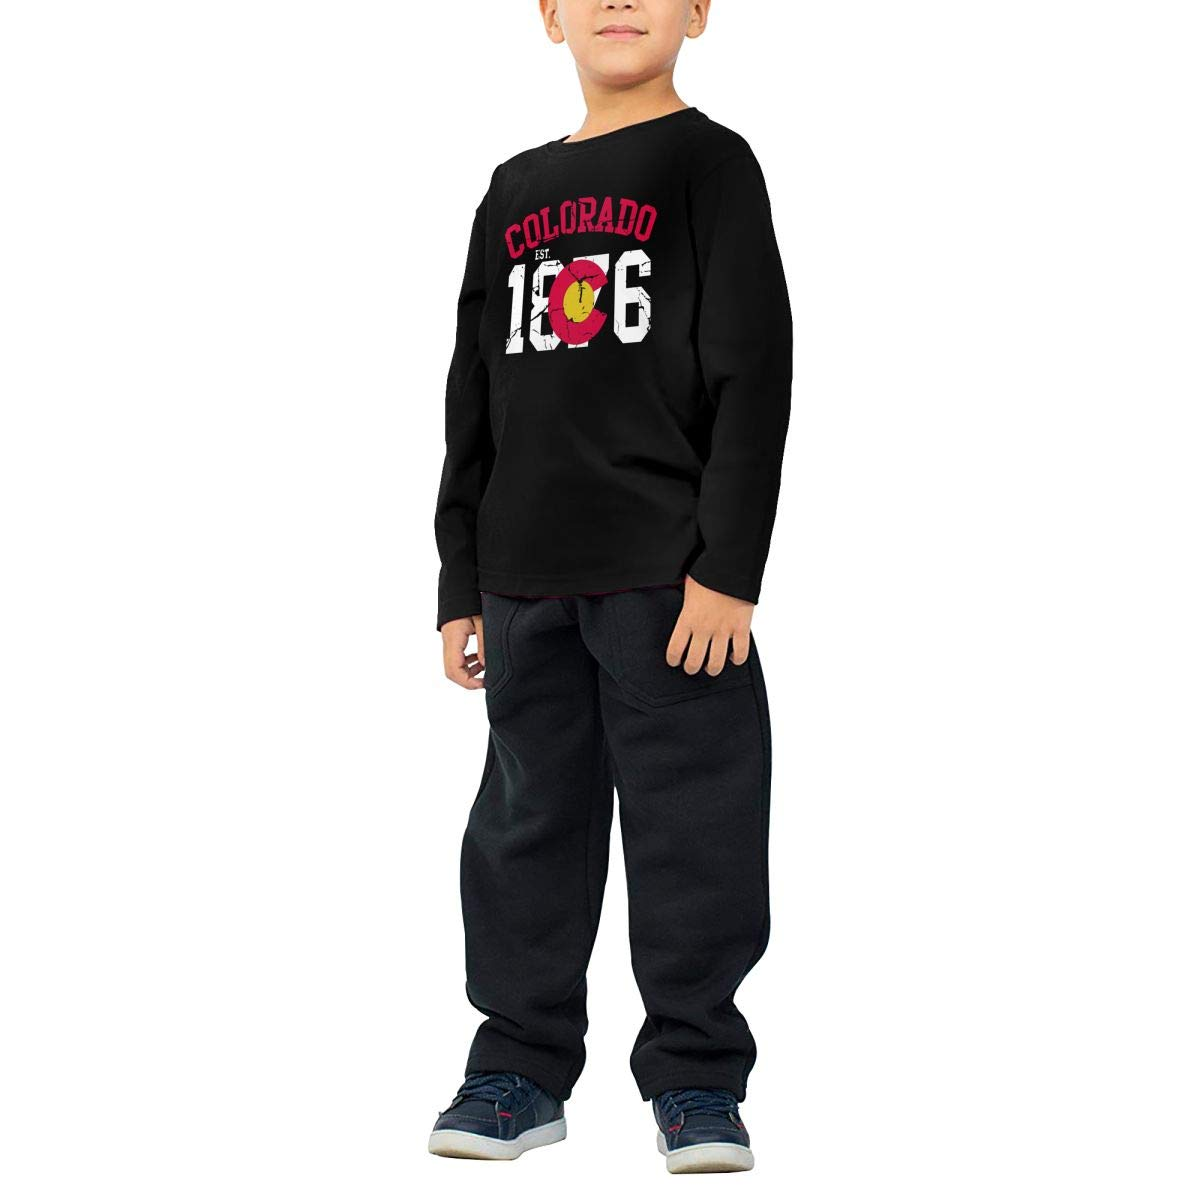 Vintage Colorado 1876 Kids T-Shirt Long Sleeve Boys Girls T-Shirt